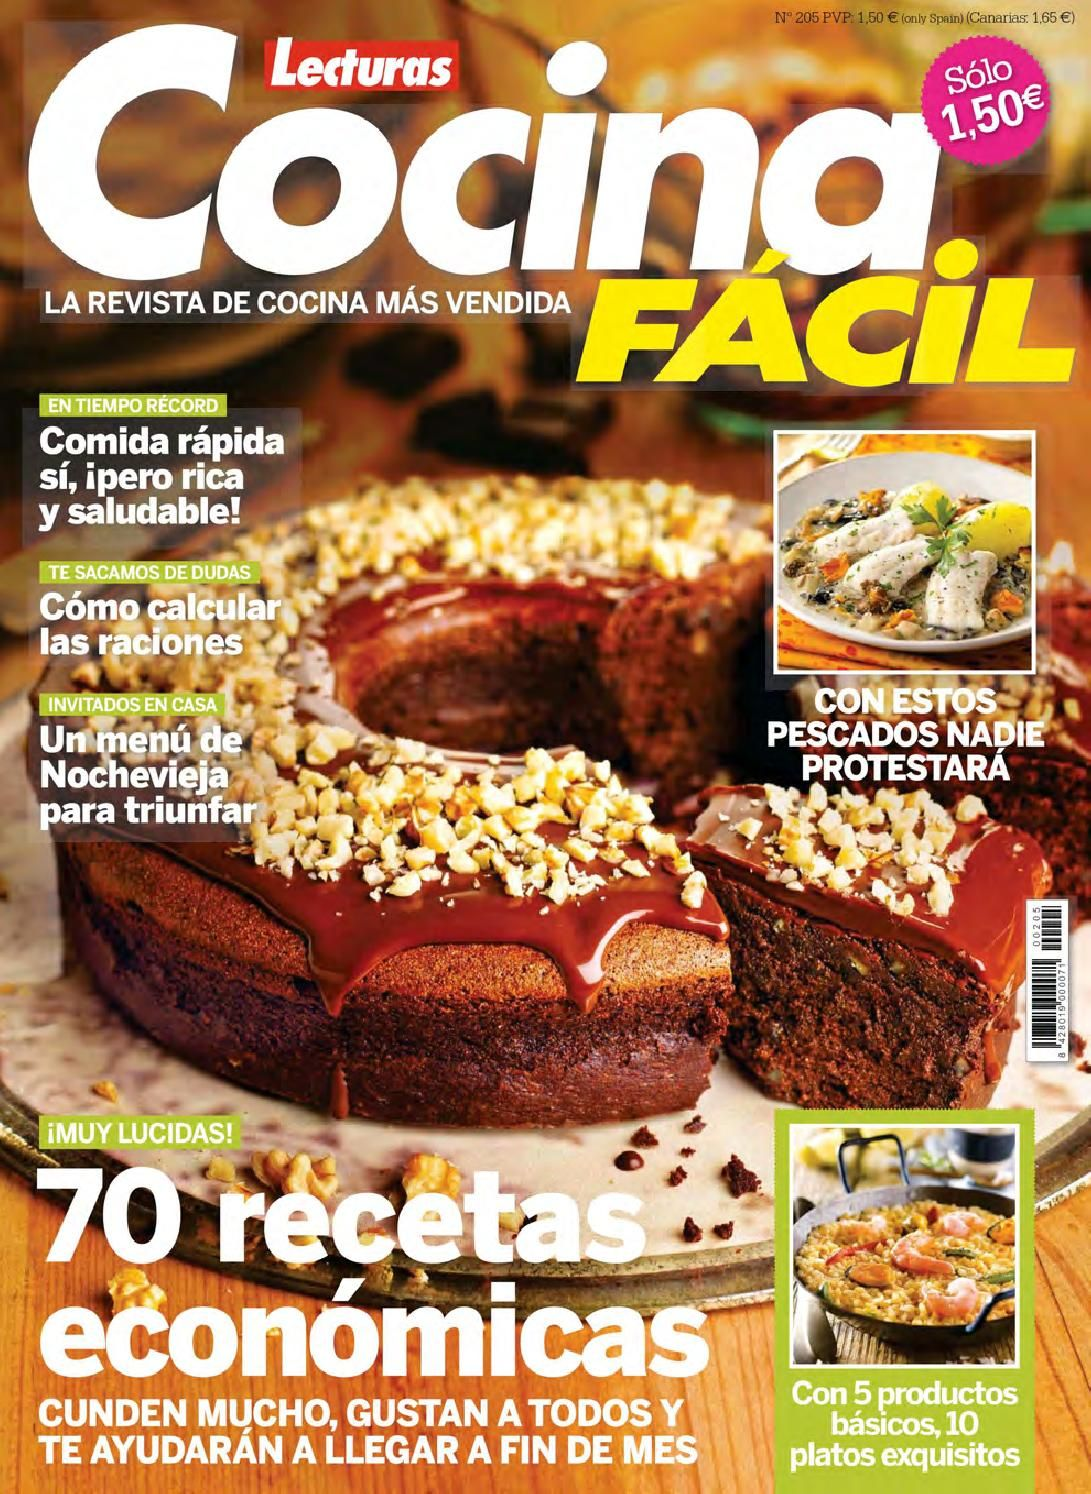 Cocina facil lecturas enero 2015 r cocina pinterest thermomix food and mexicans - Cocina facil y saludable thermomix ...